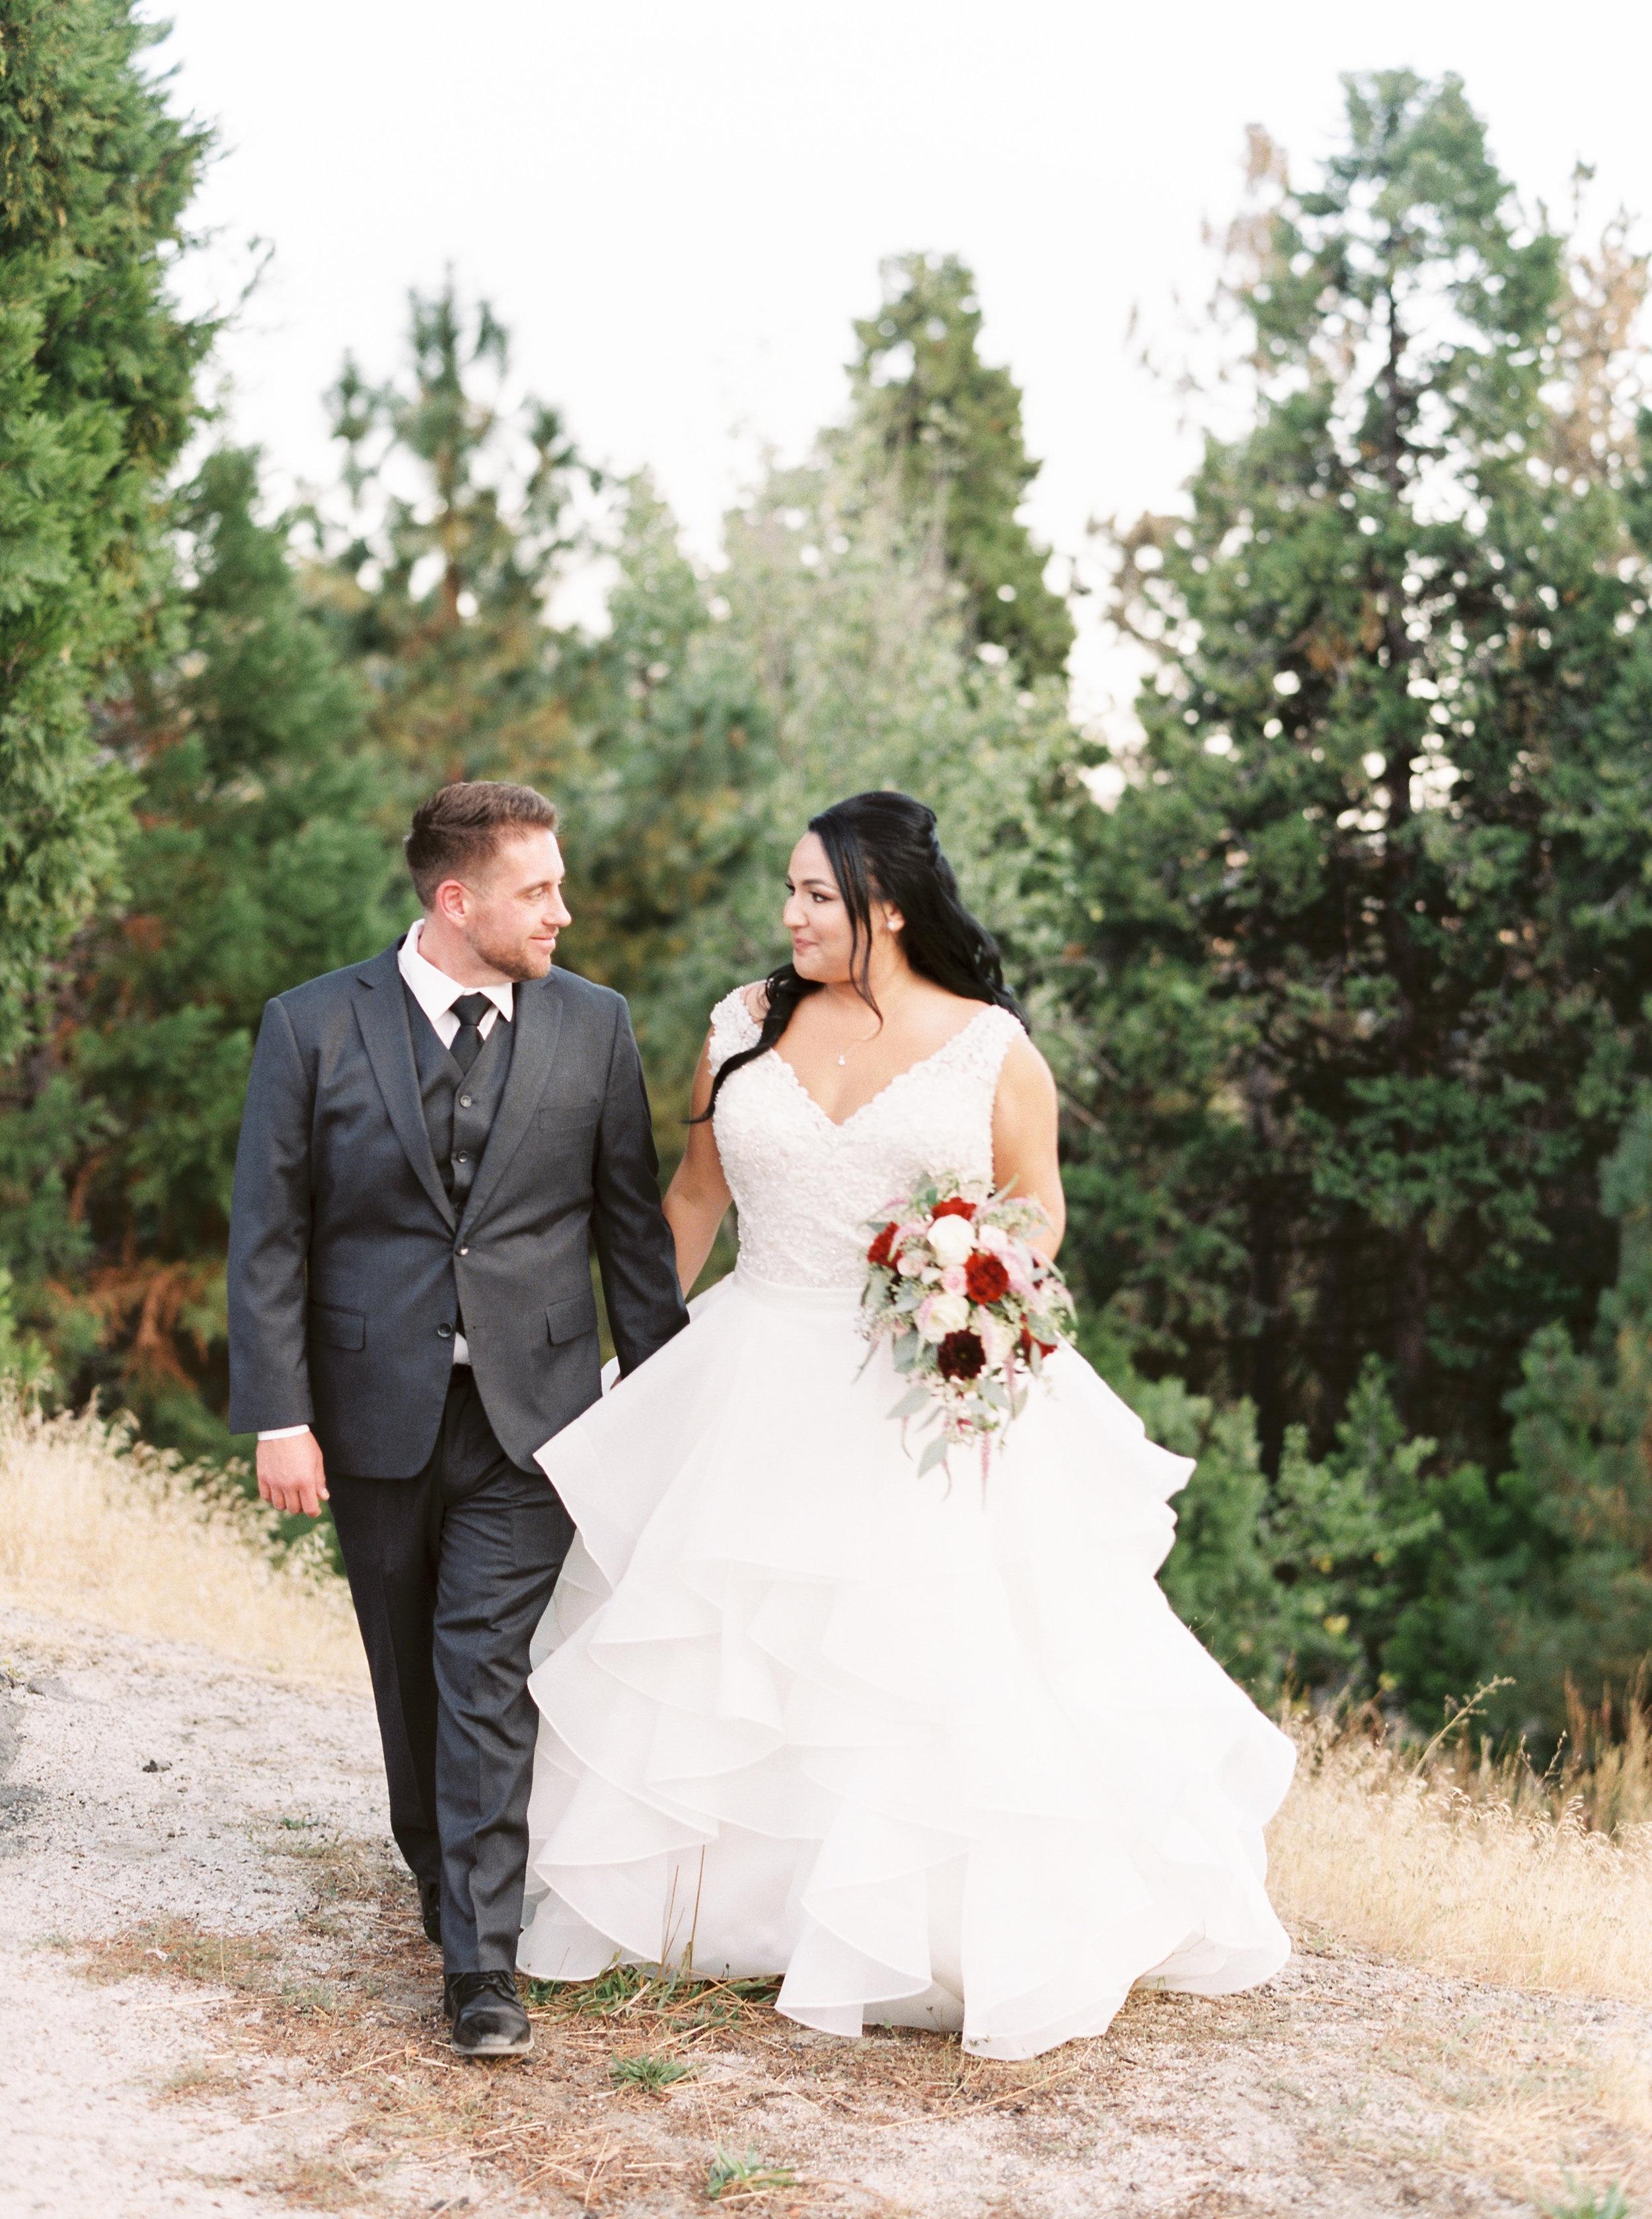 Tenaya-lodge-wedding-at-yosemite-national-park-california-14.jpg